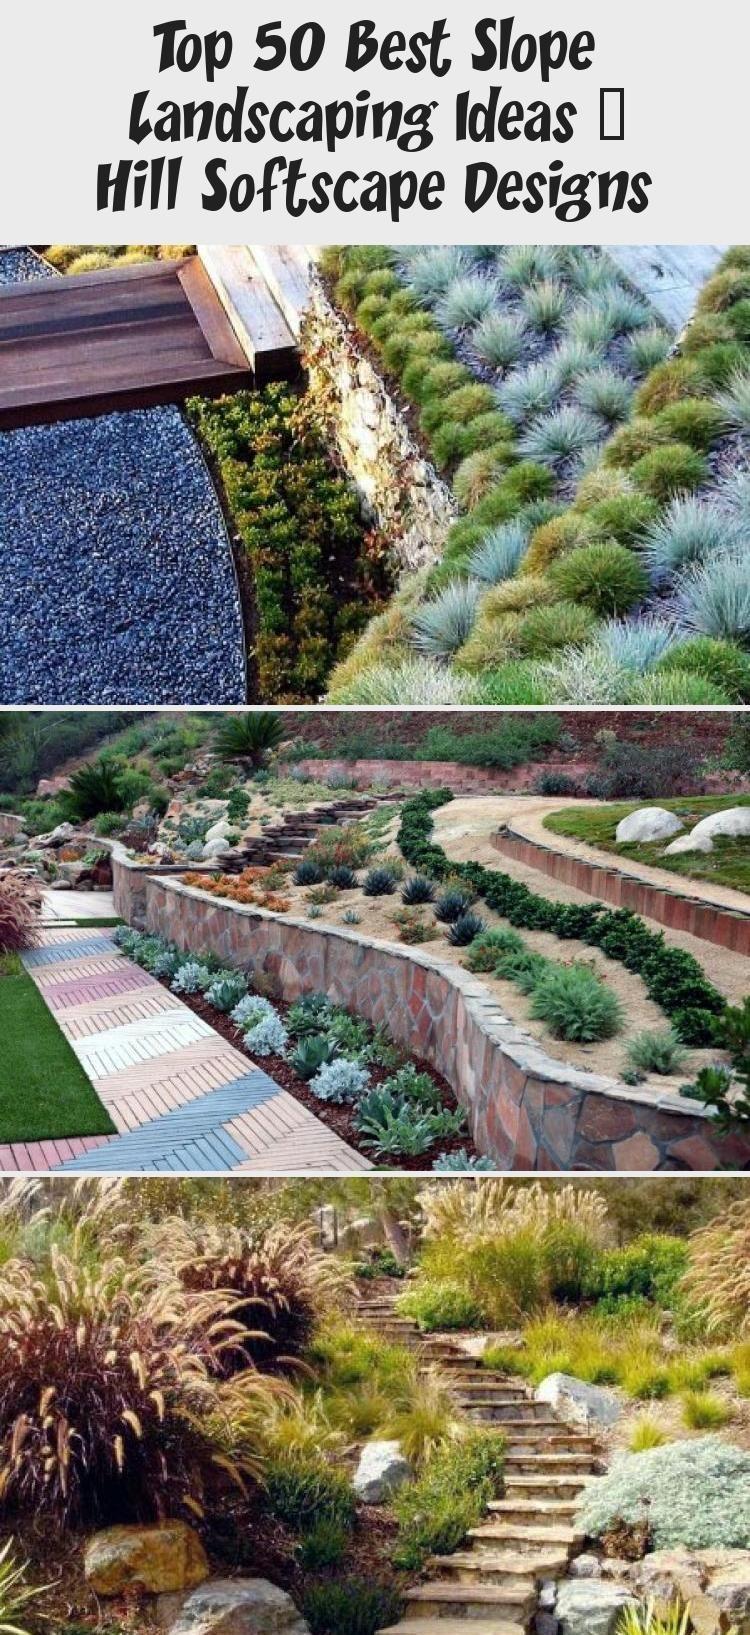 Top 50 Best Slope Landscaping Ideas Hill Softscape Designs Garden Designs Garden Hil In 2020 Backyard Garden Layout Garden Design Backyard Landscaping